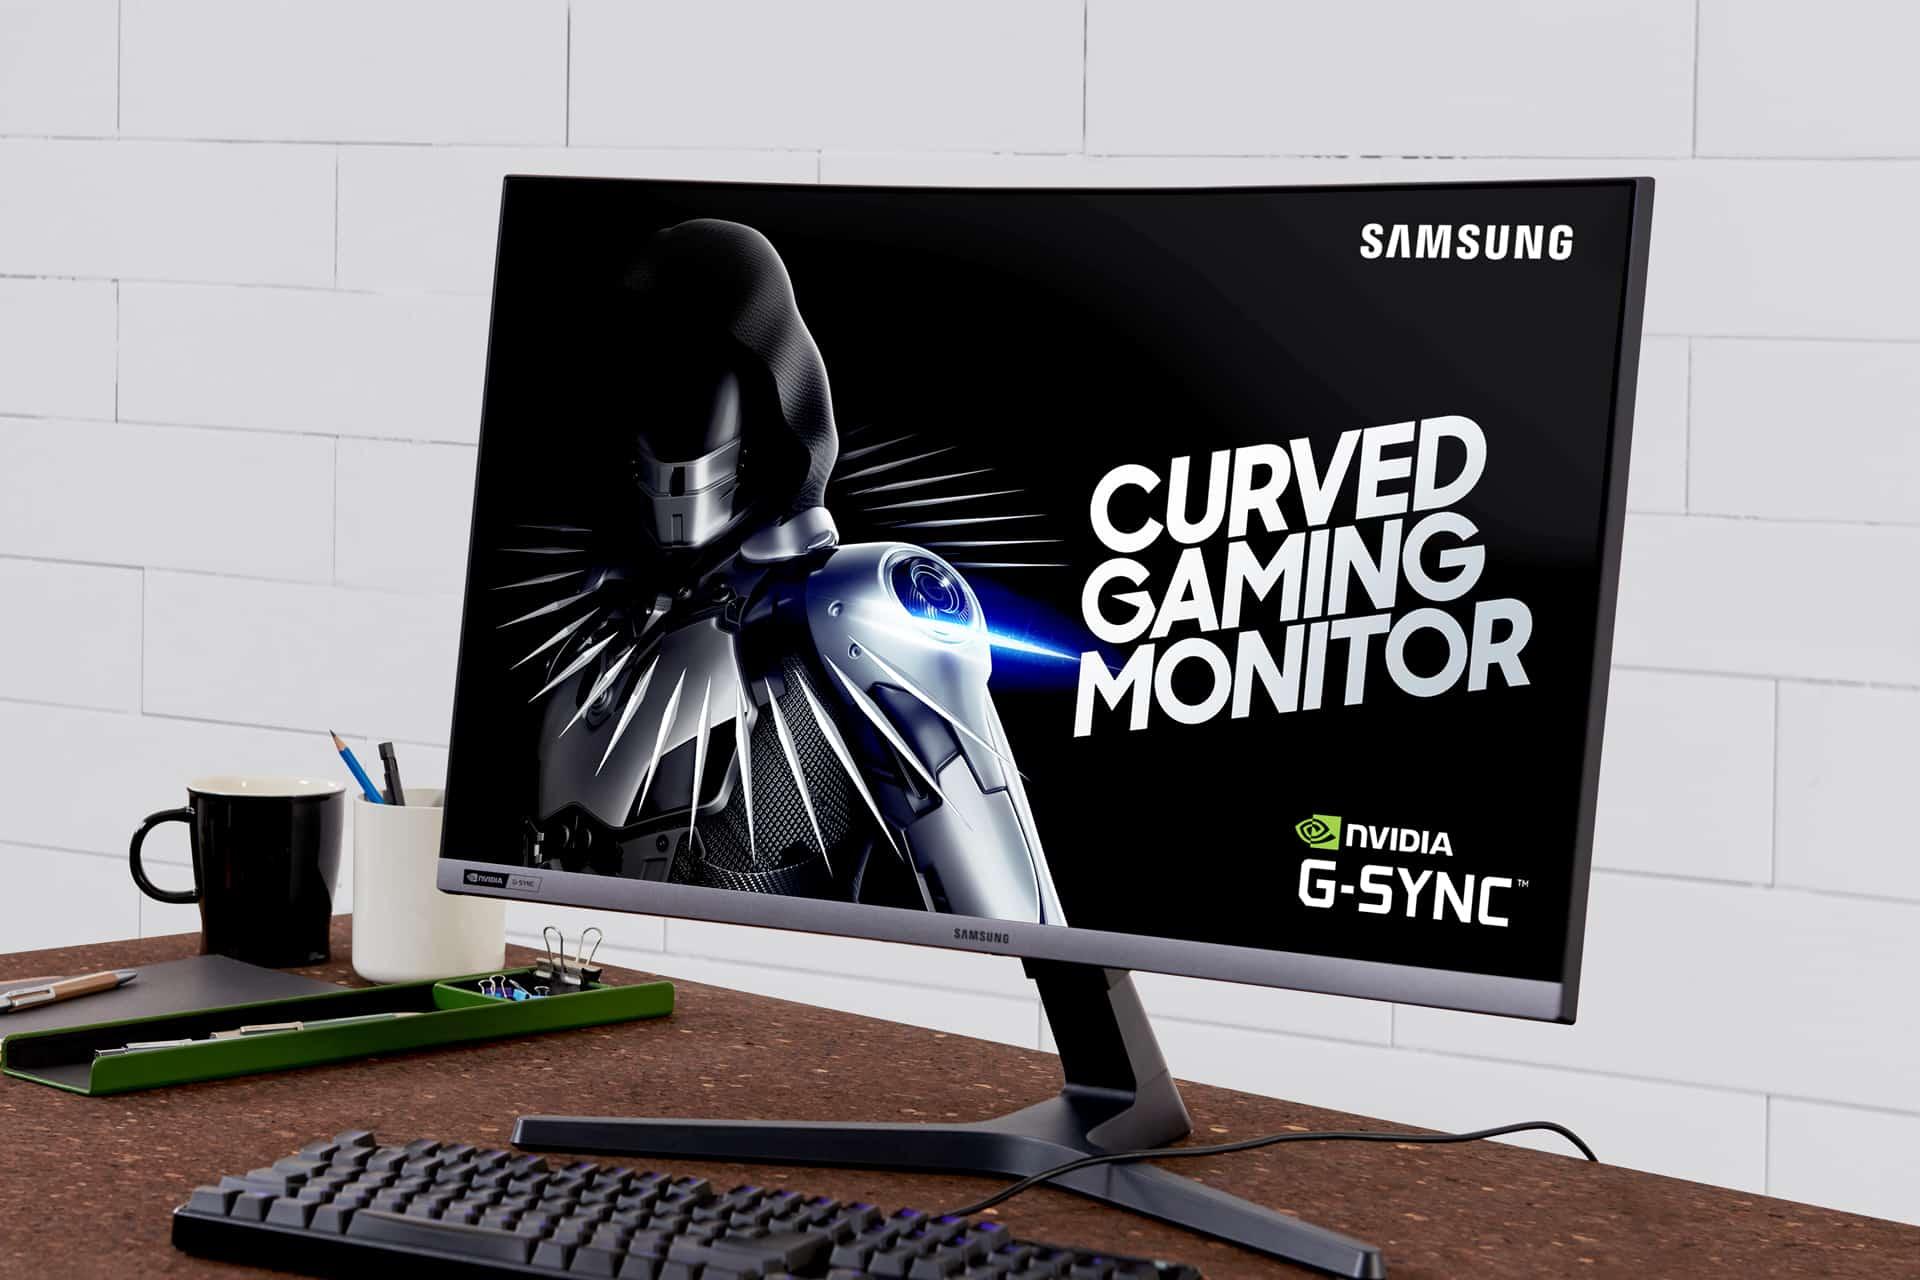 Samsung C27RG5 Curved Gaming Monitor